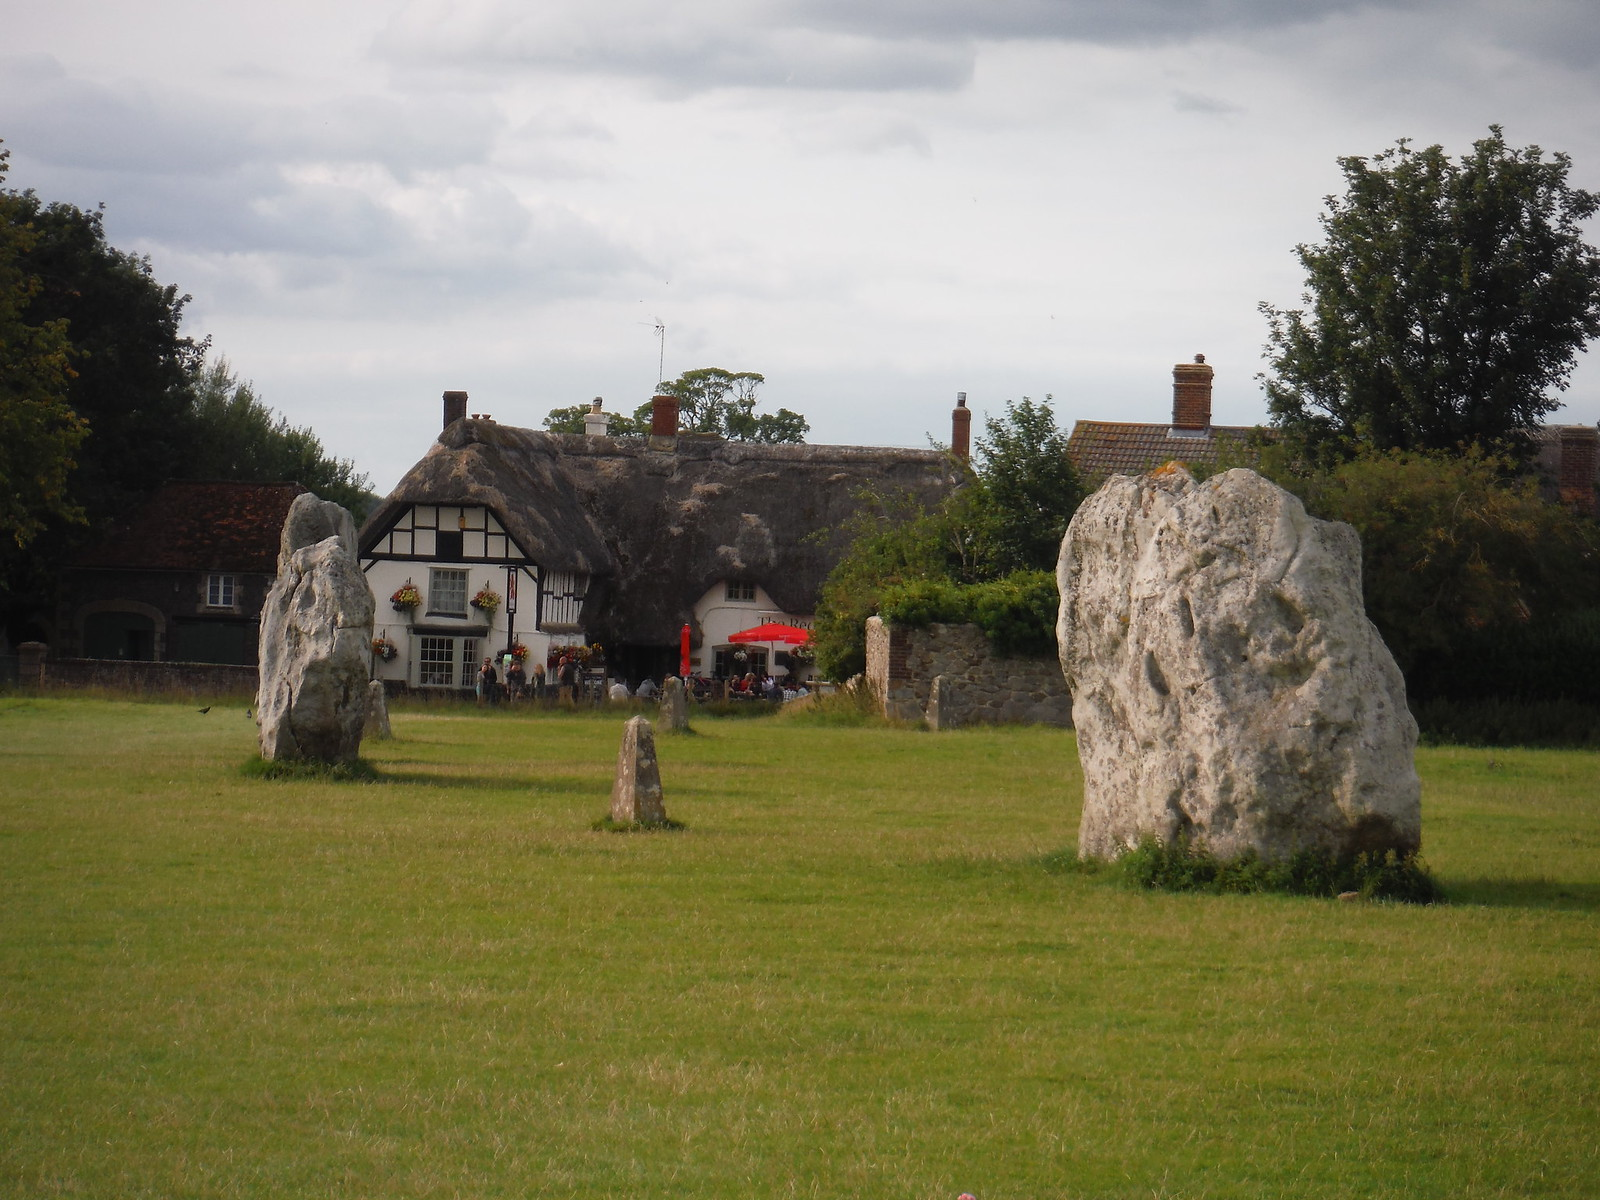 Avebury Standing Stones, and The Red Lion Pub SWC Walk 255 Pewsey or Marlborough Circular via Avebury